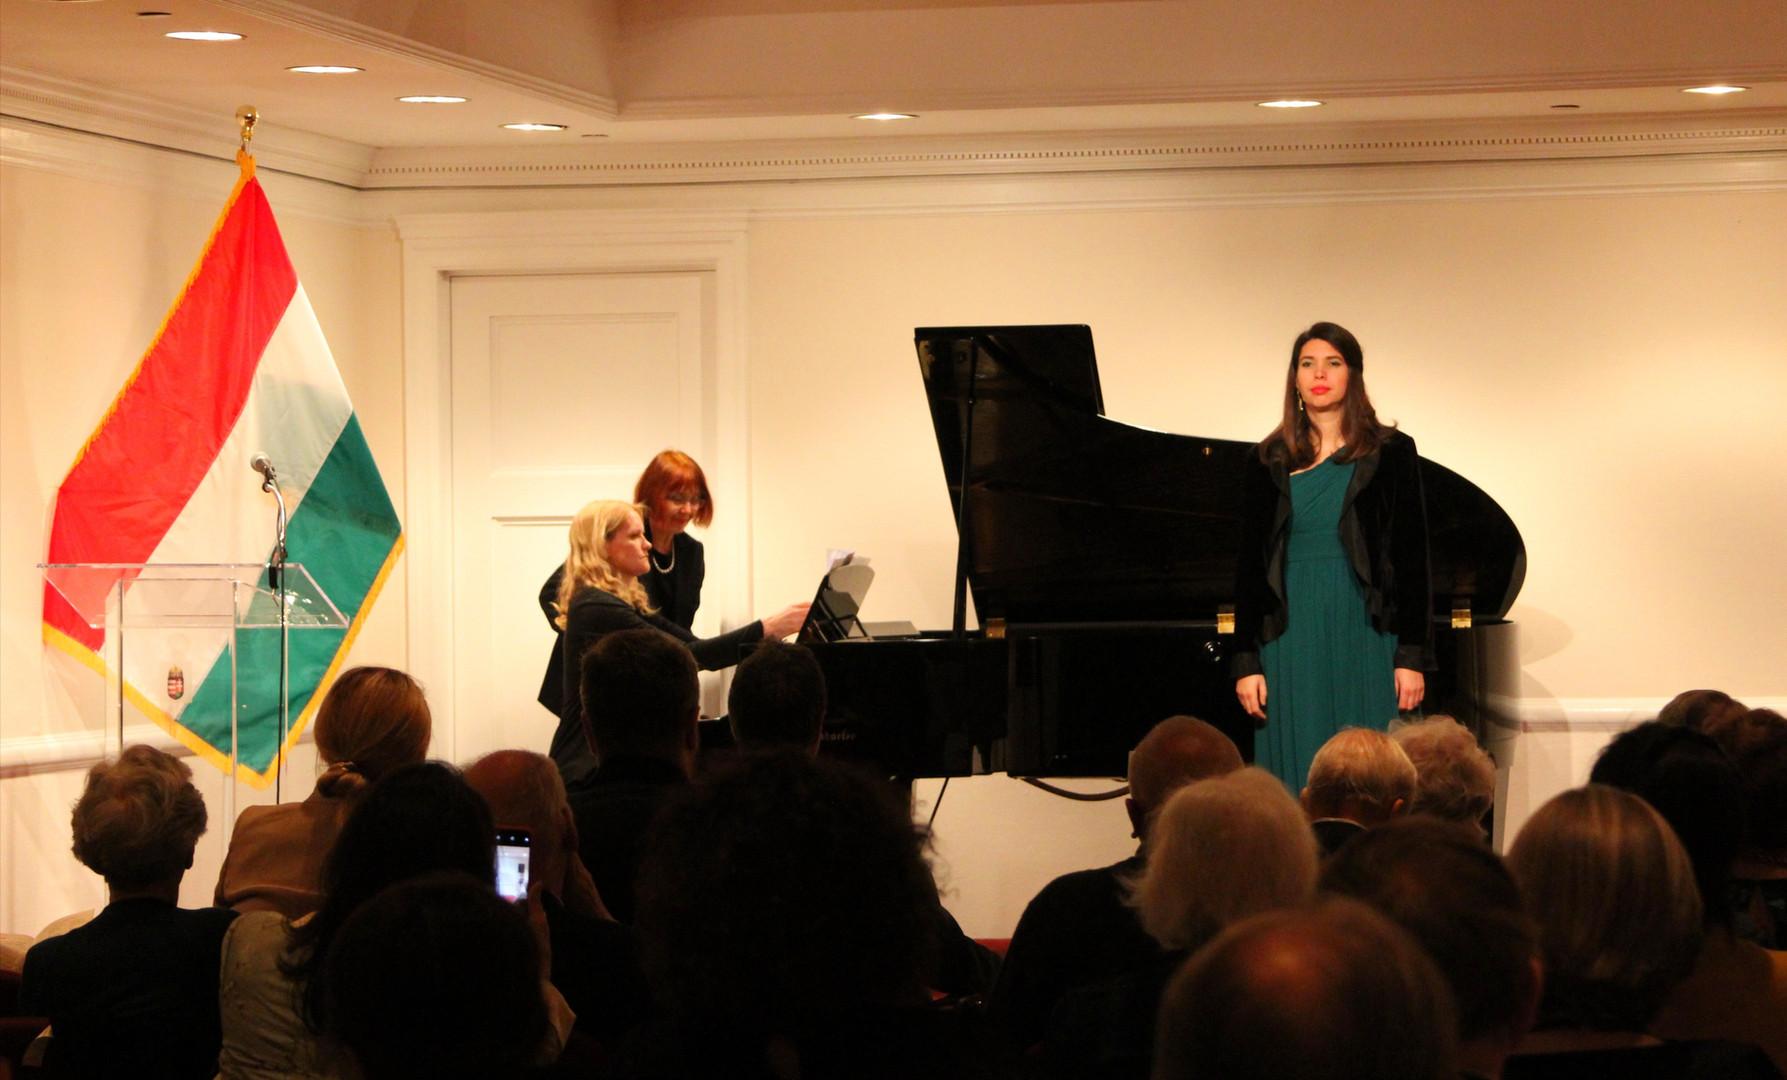 Concert by Salon de Virtuosi, New York, Ambassy of Hungary